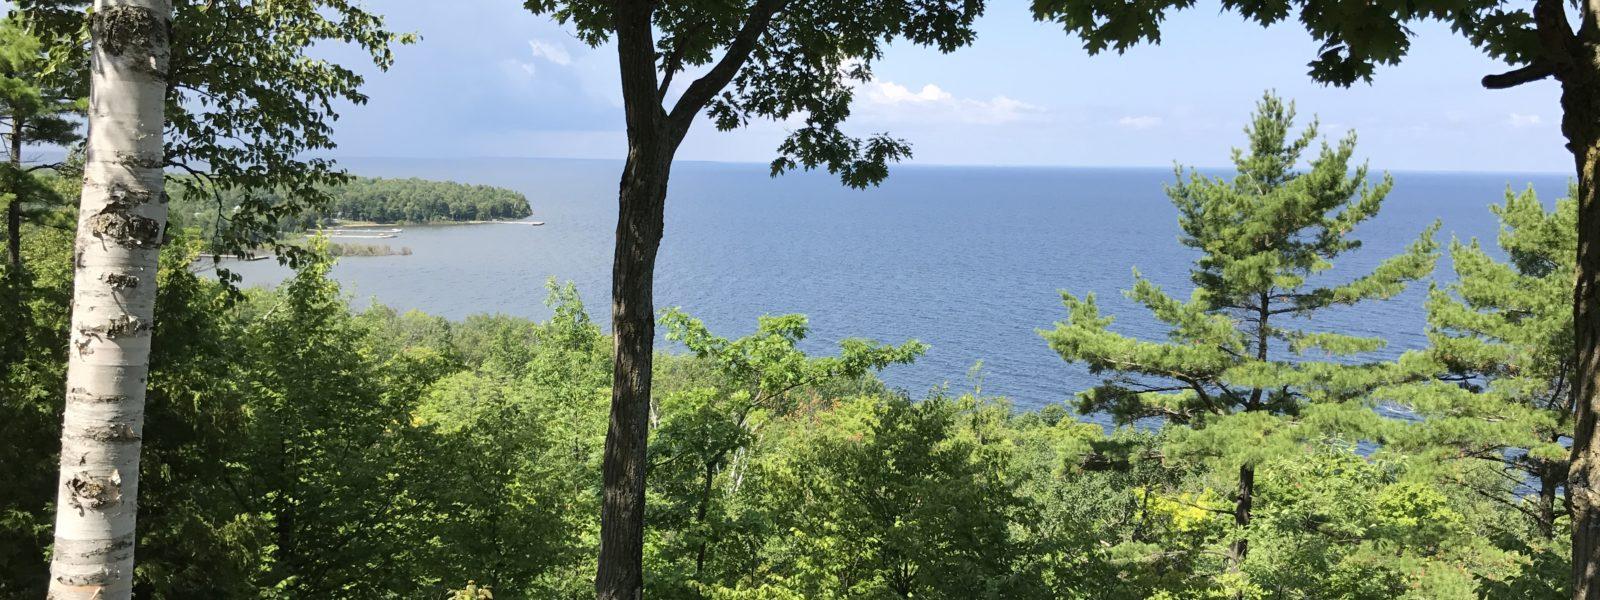 Vacation Rentals In Door County Wi Homes Cottages Condos